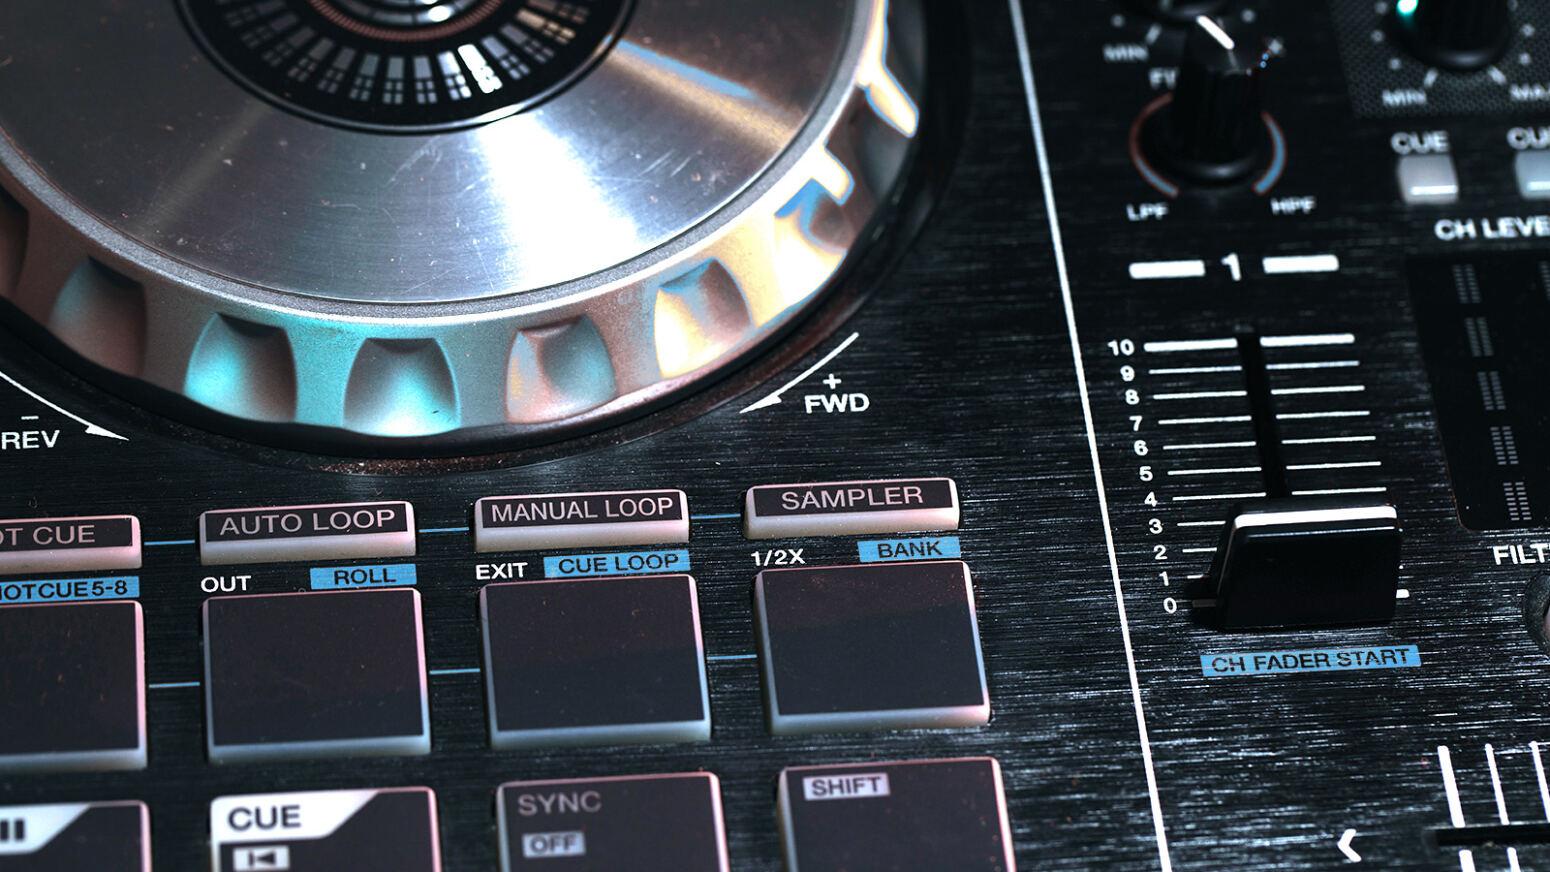 Electronic music